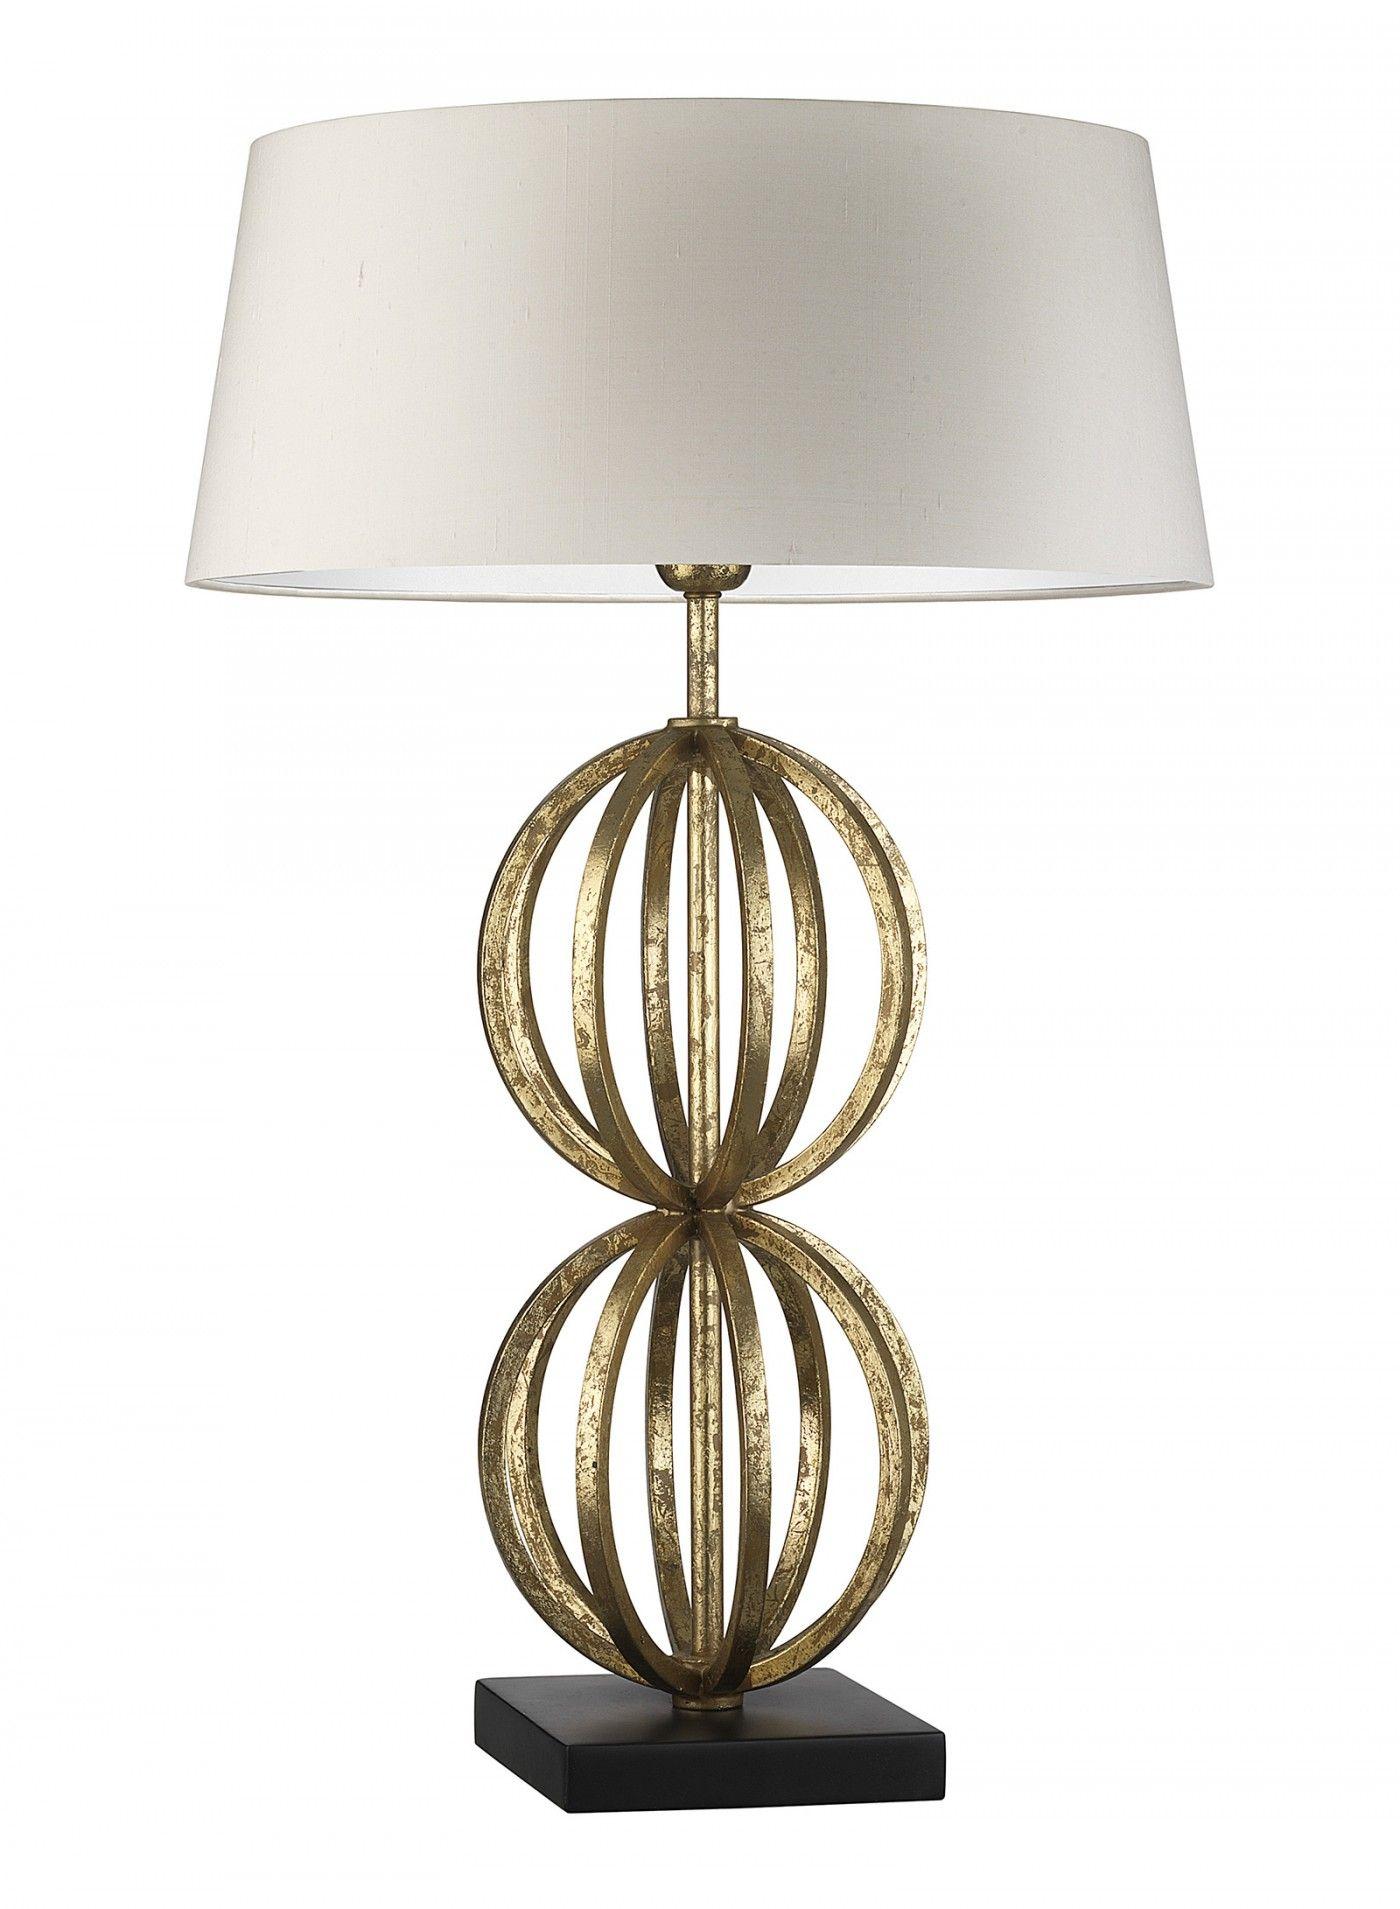 Rollo antique gold table lamp heathfield co light table lamp rollo antique gold table lamp heathfield co aloadofball Gallery